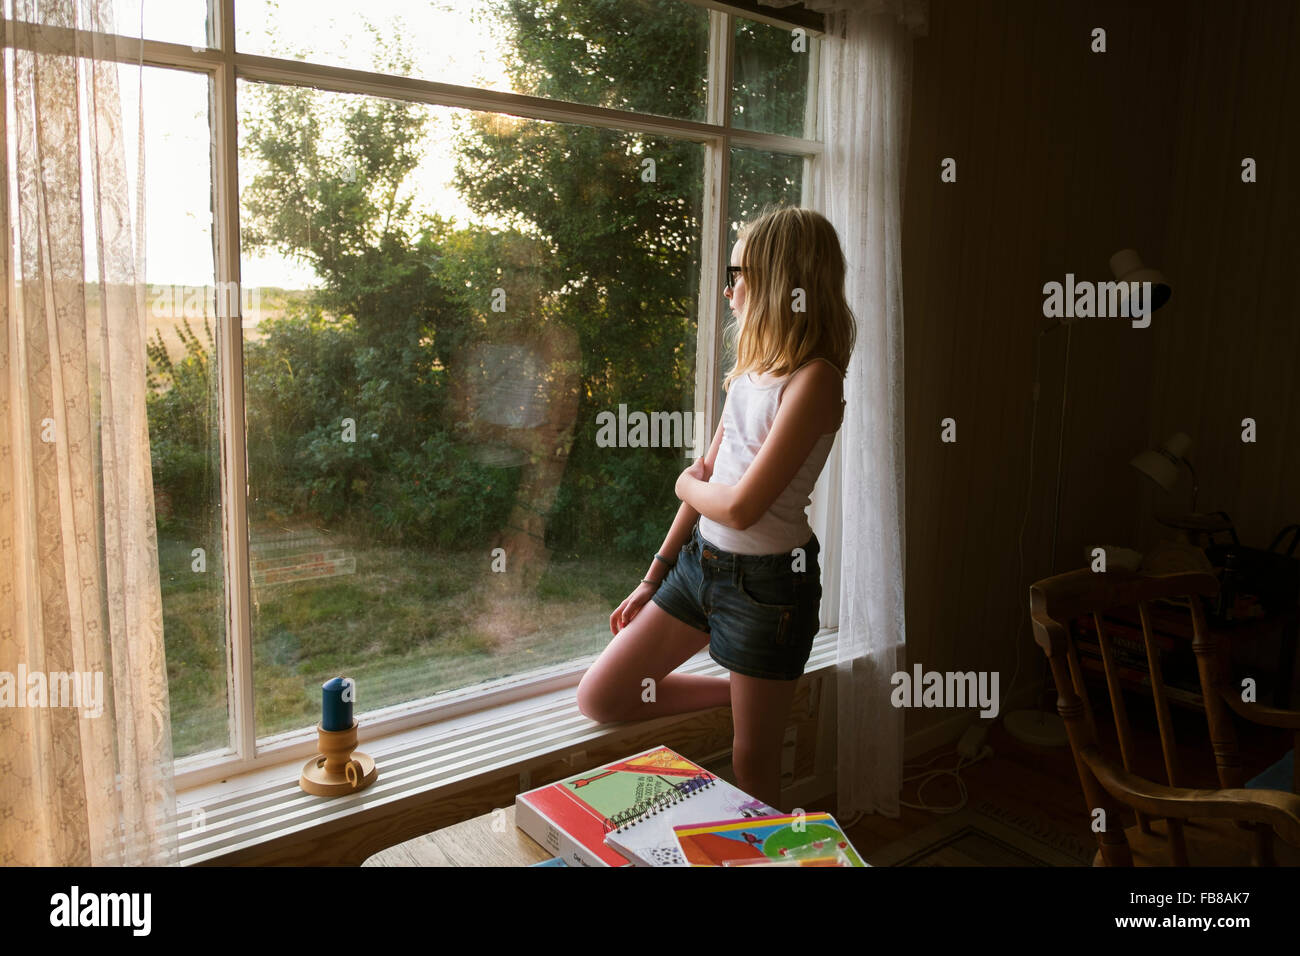 Suecia, Skane, Vejbystrand (10-11), chica busca aunque la ventana Imagen De Stock